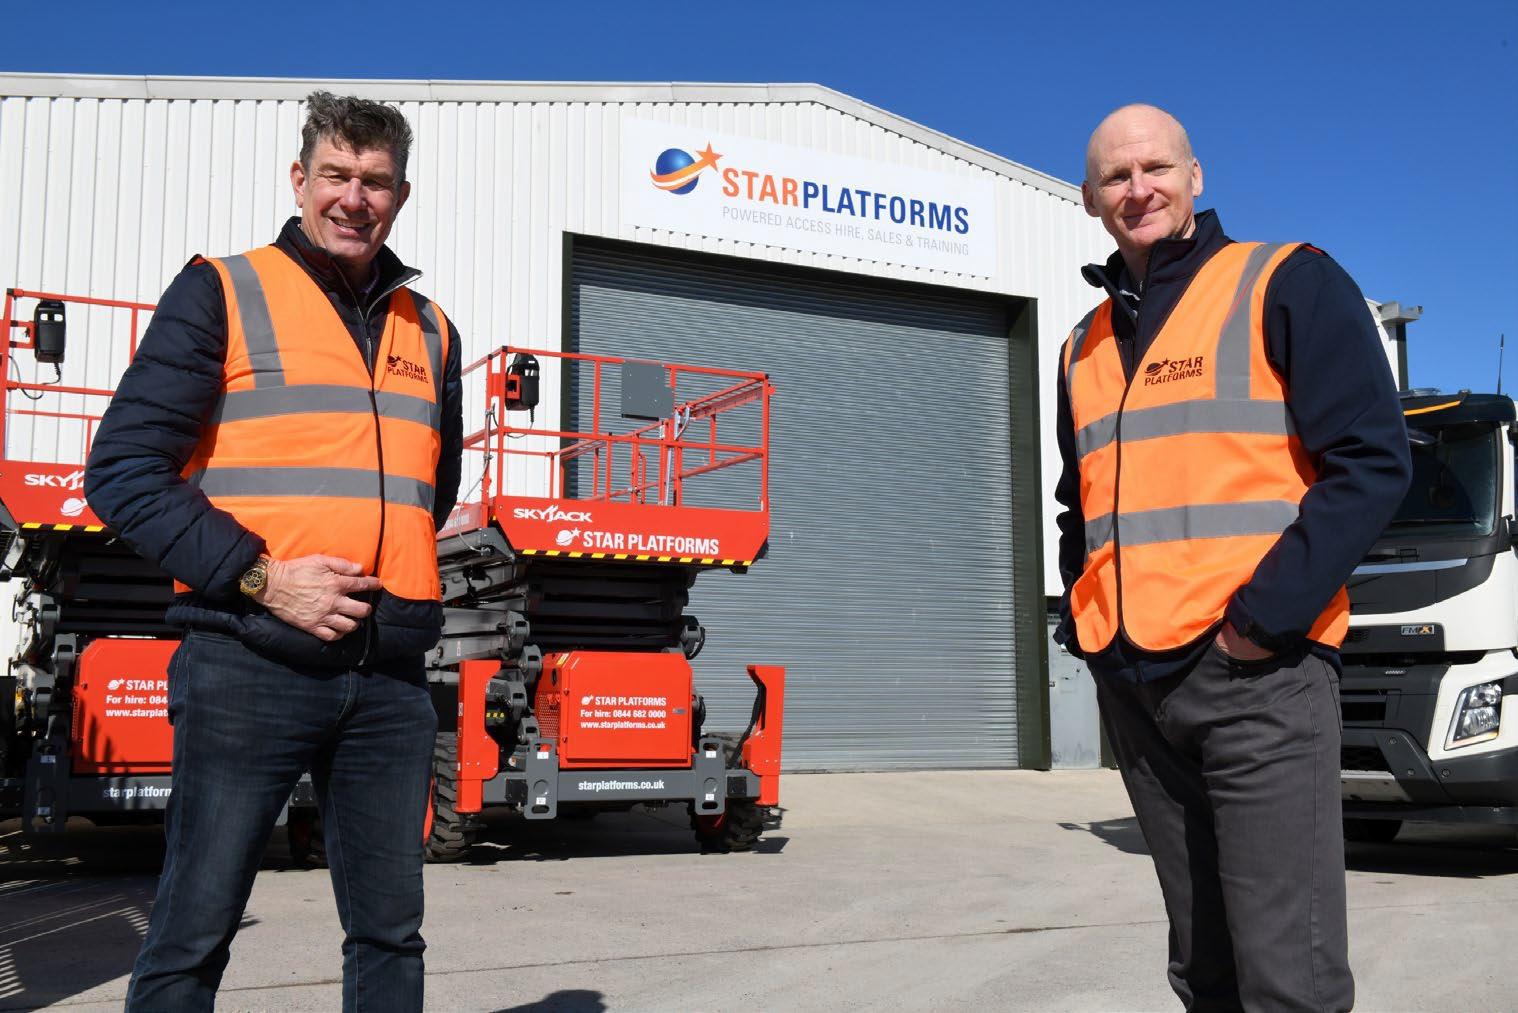 Star Platforms opens in Bridgwater